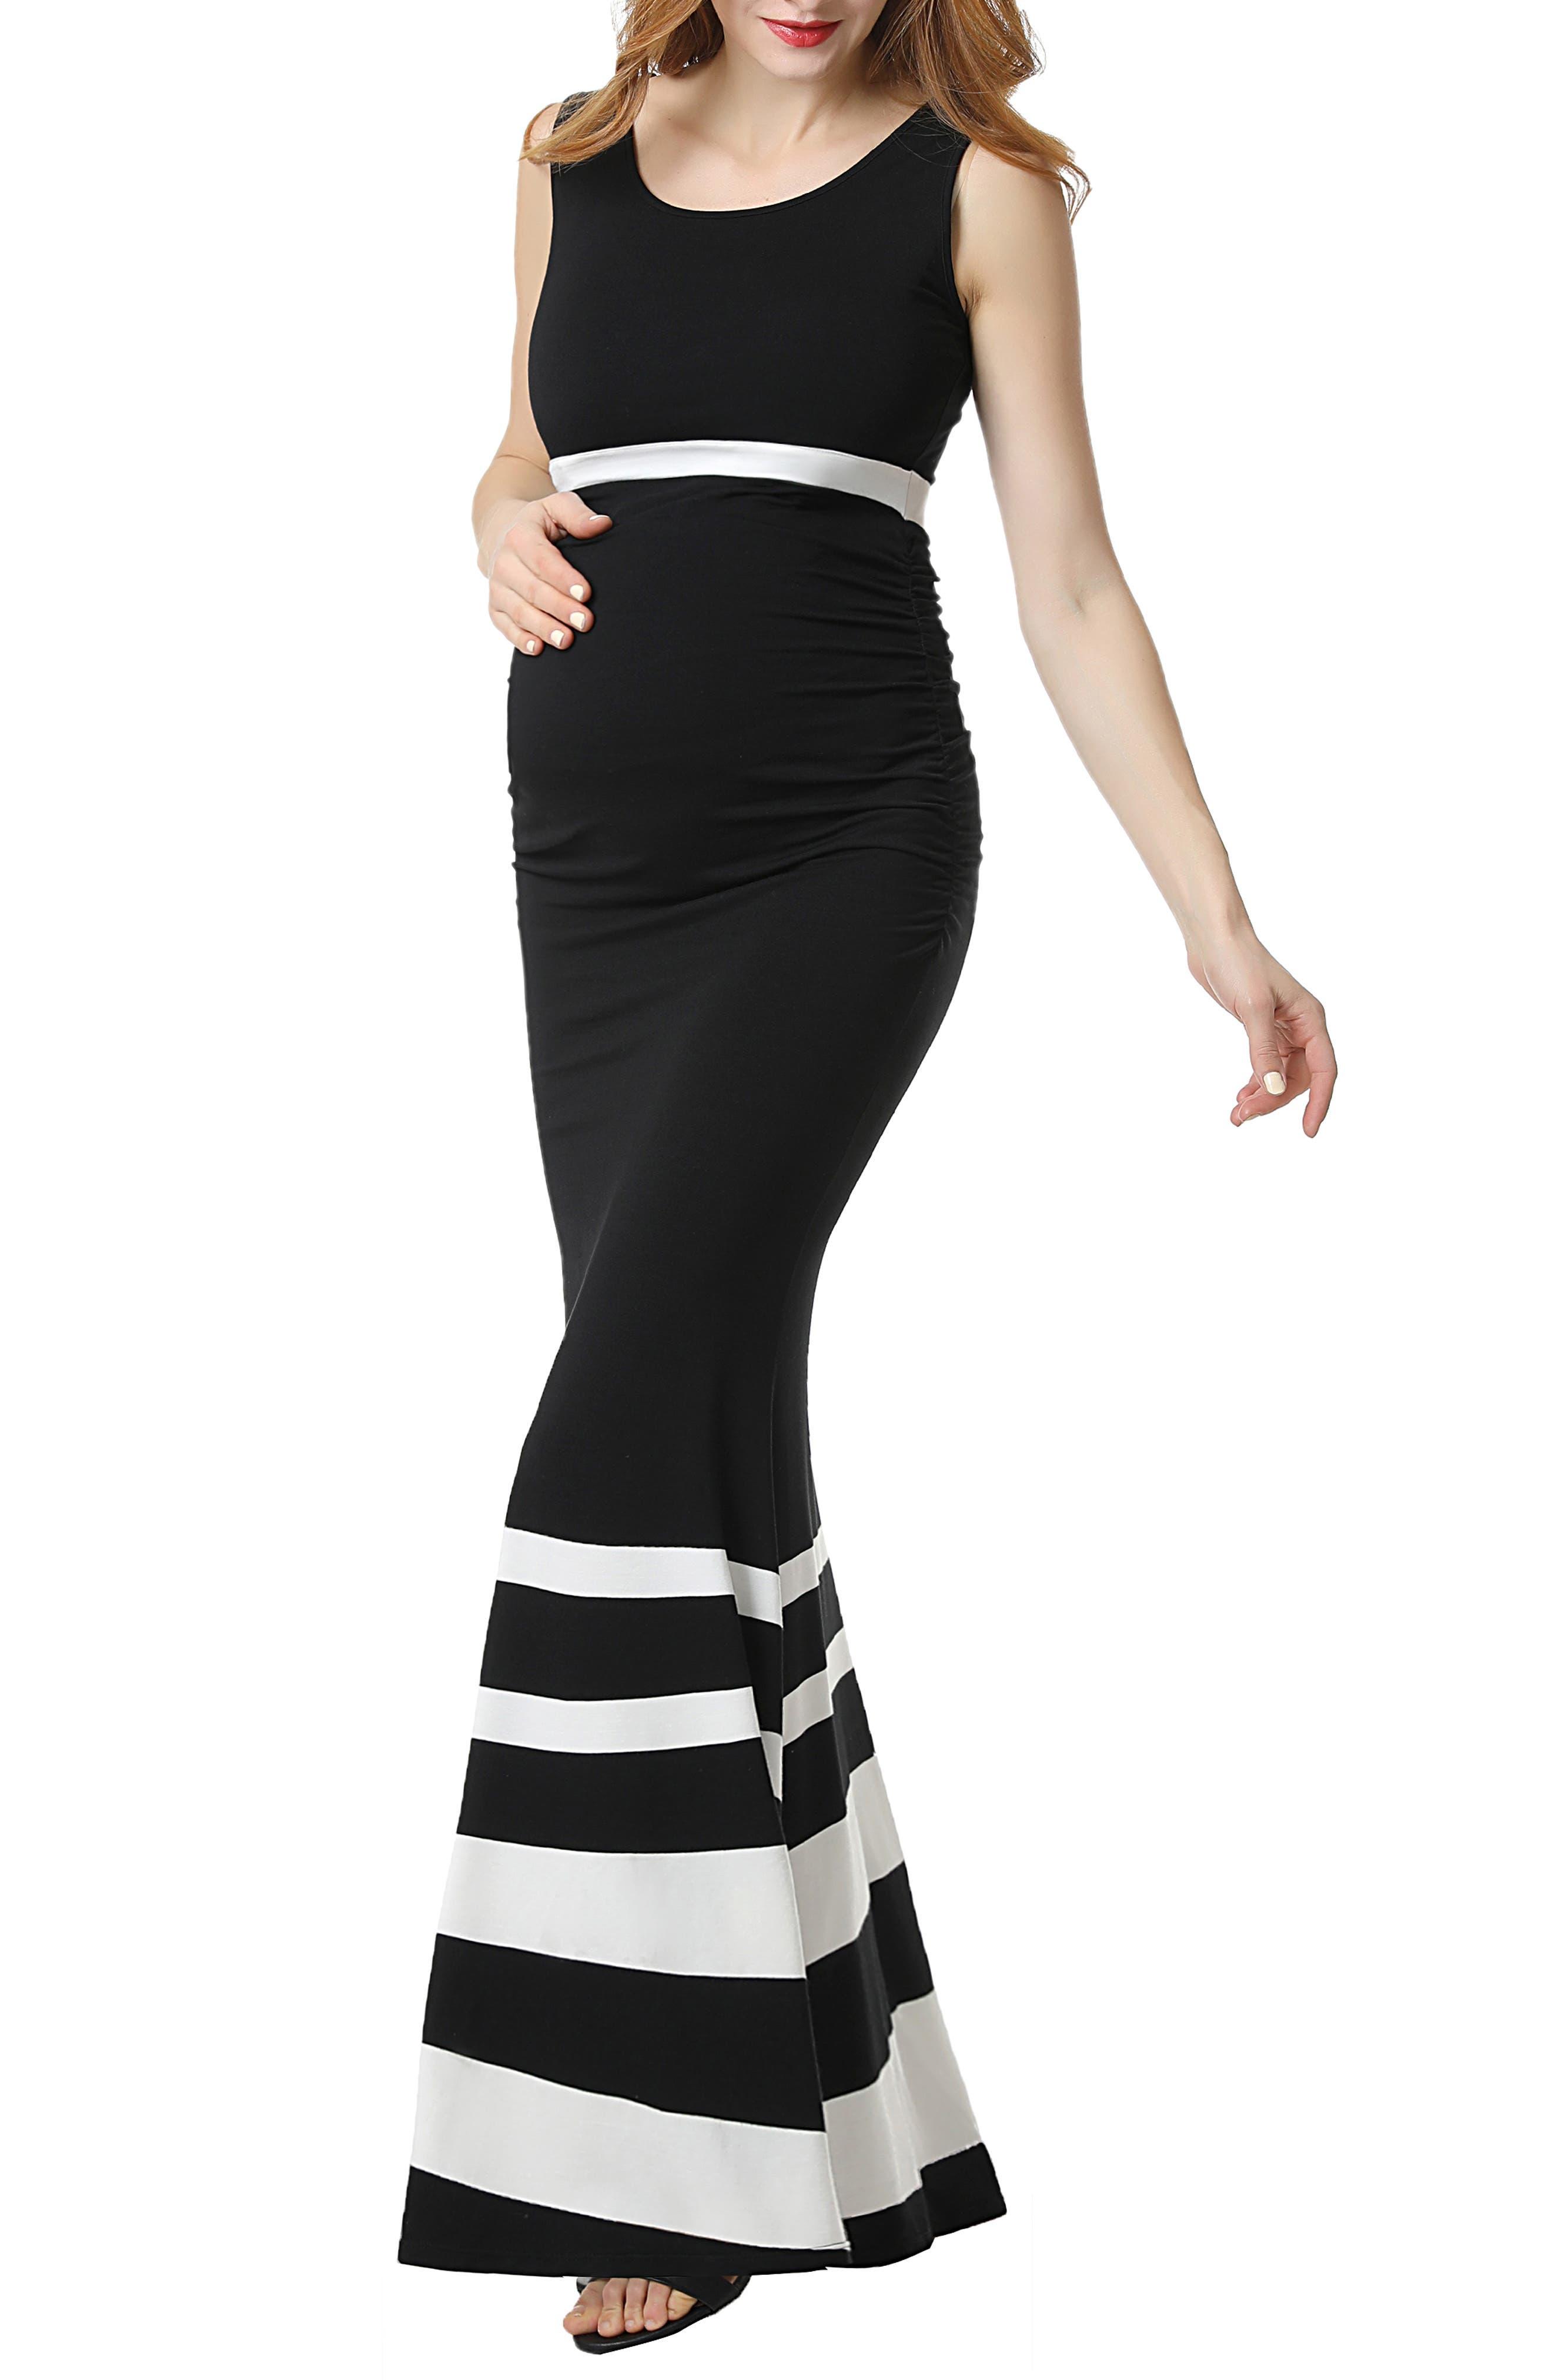 Cortana Stripe Maternity Mermaid Maxi Dress